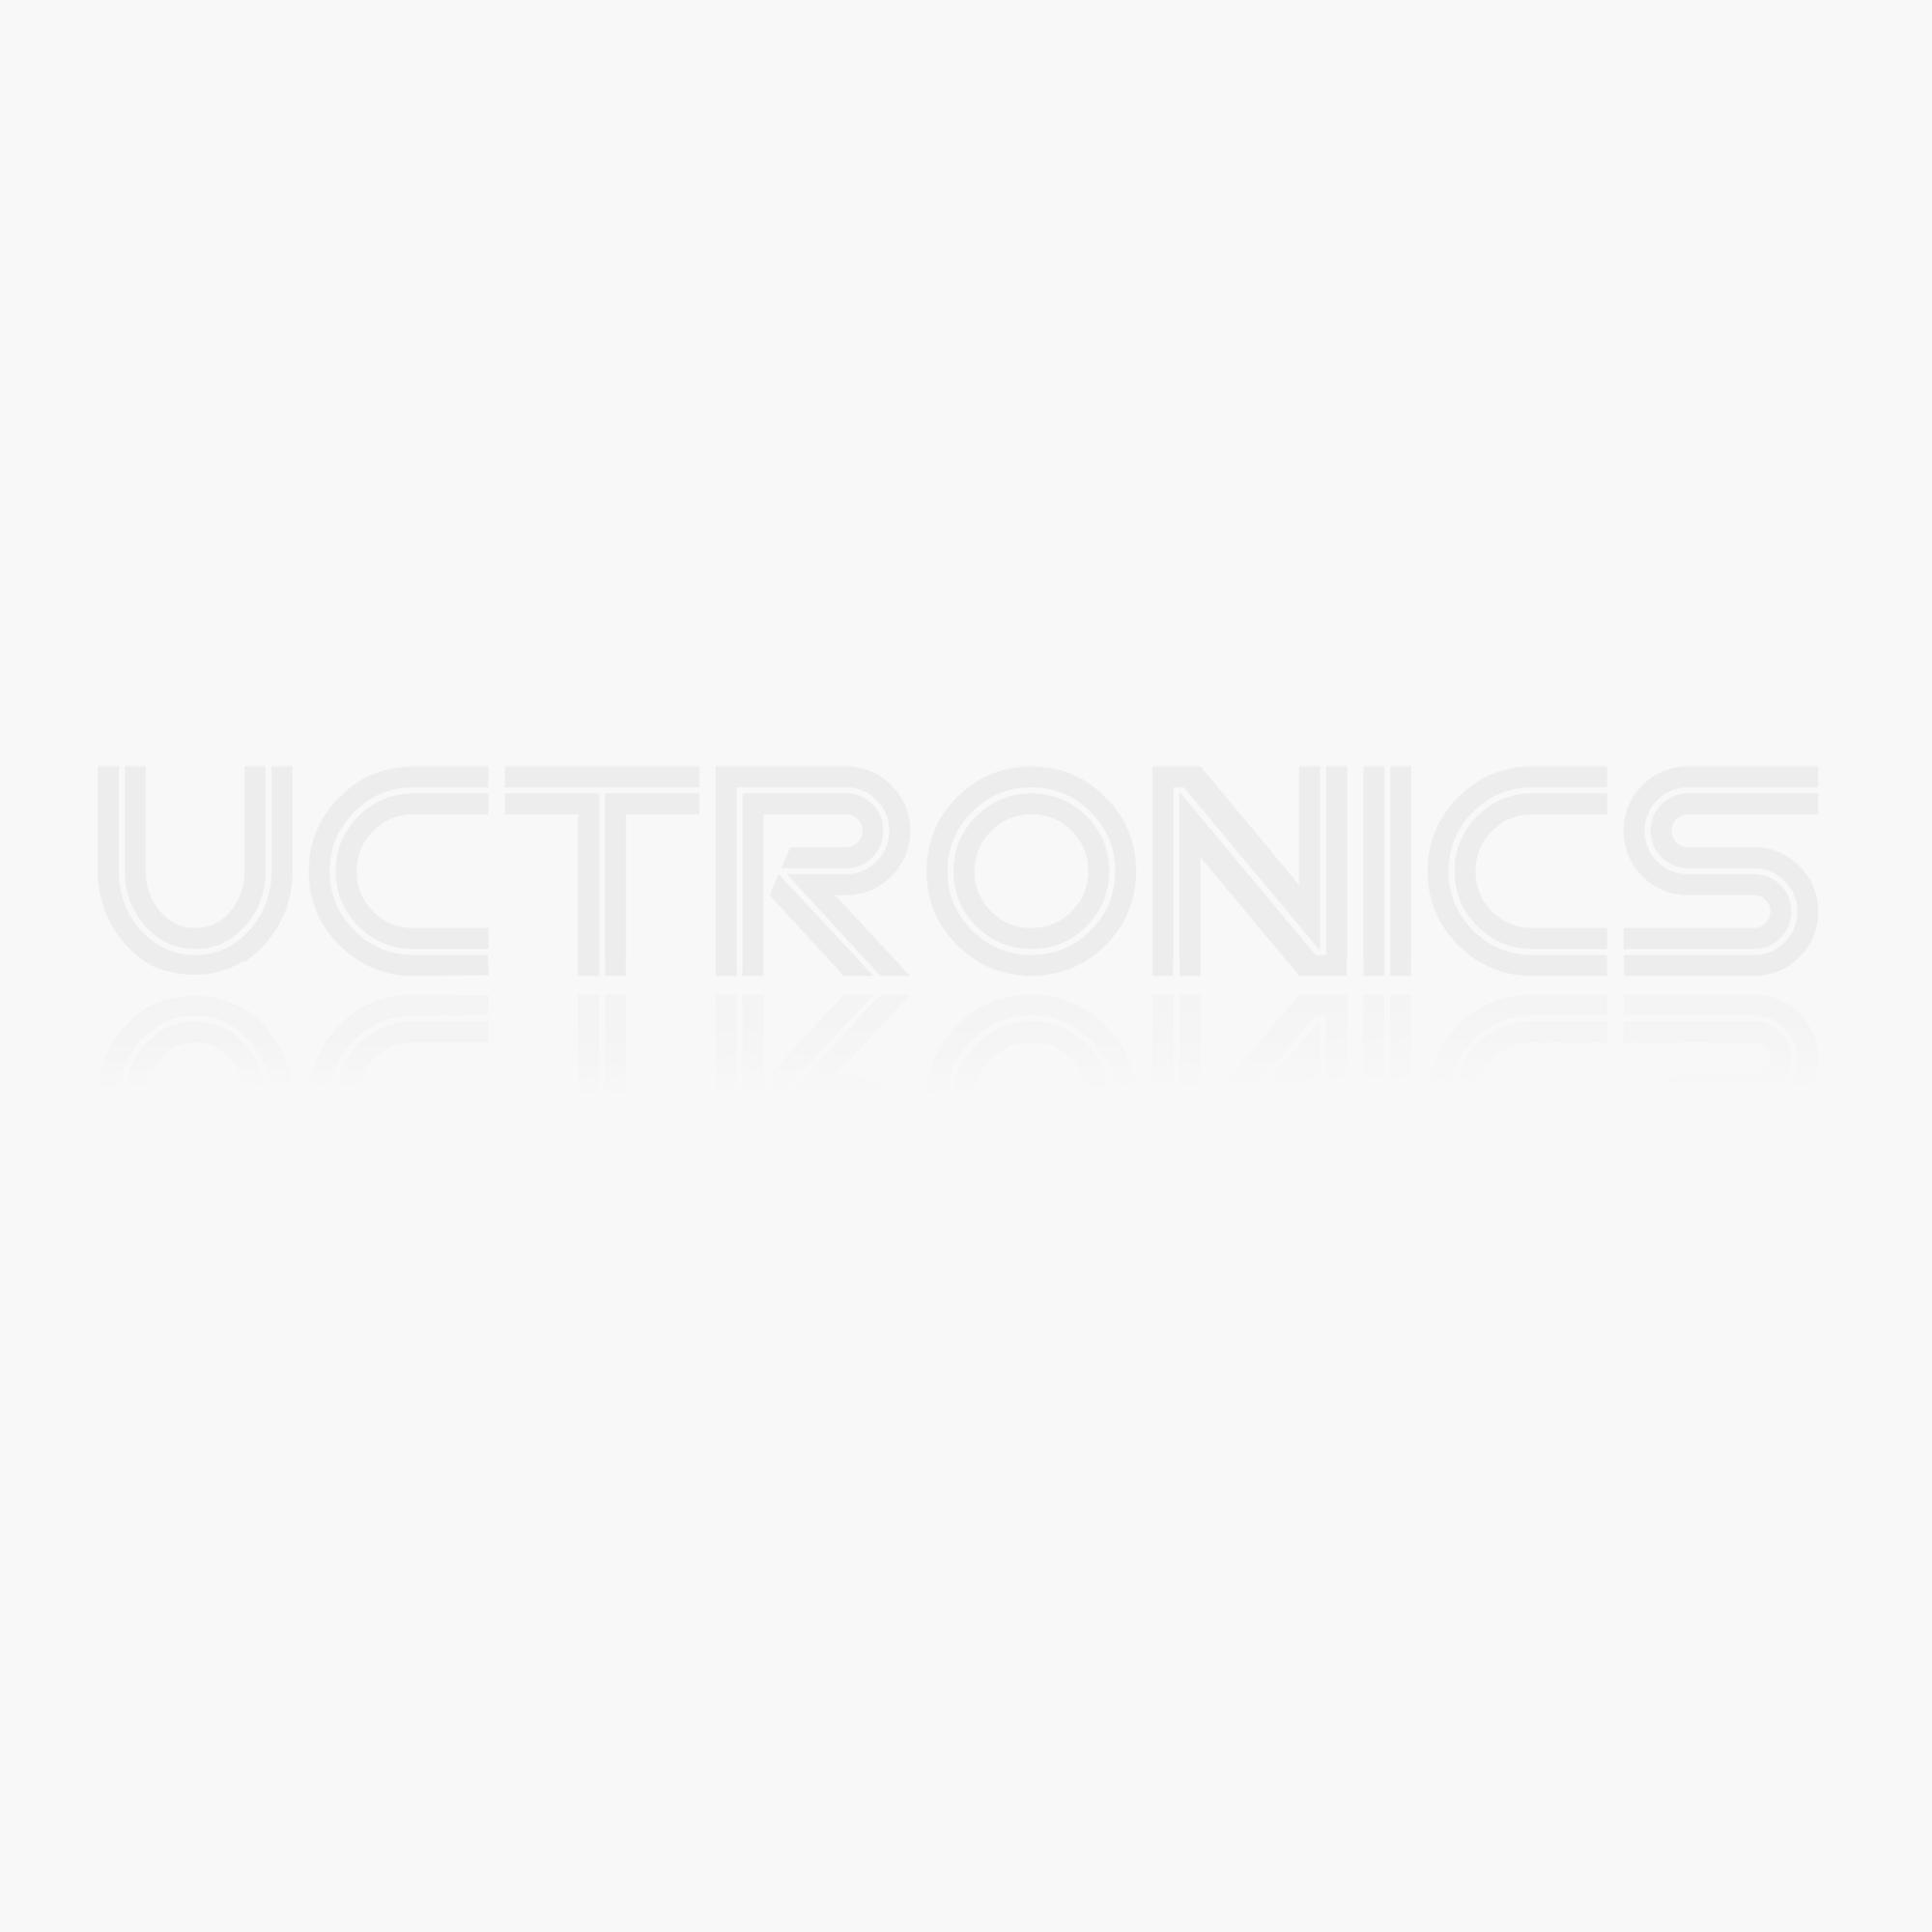 Laser Pointer Ultrasonic range finder